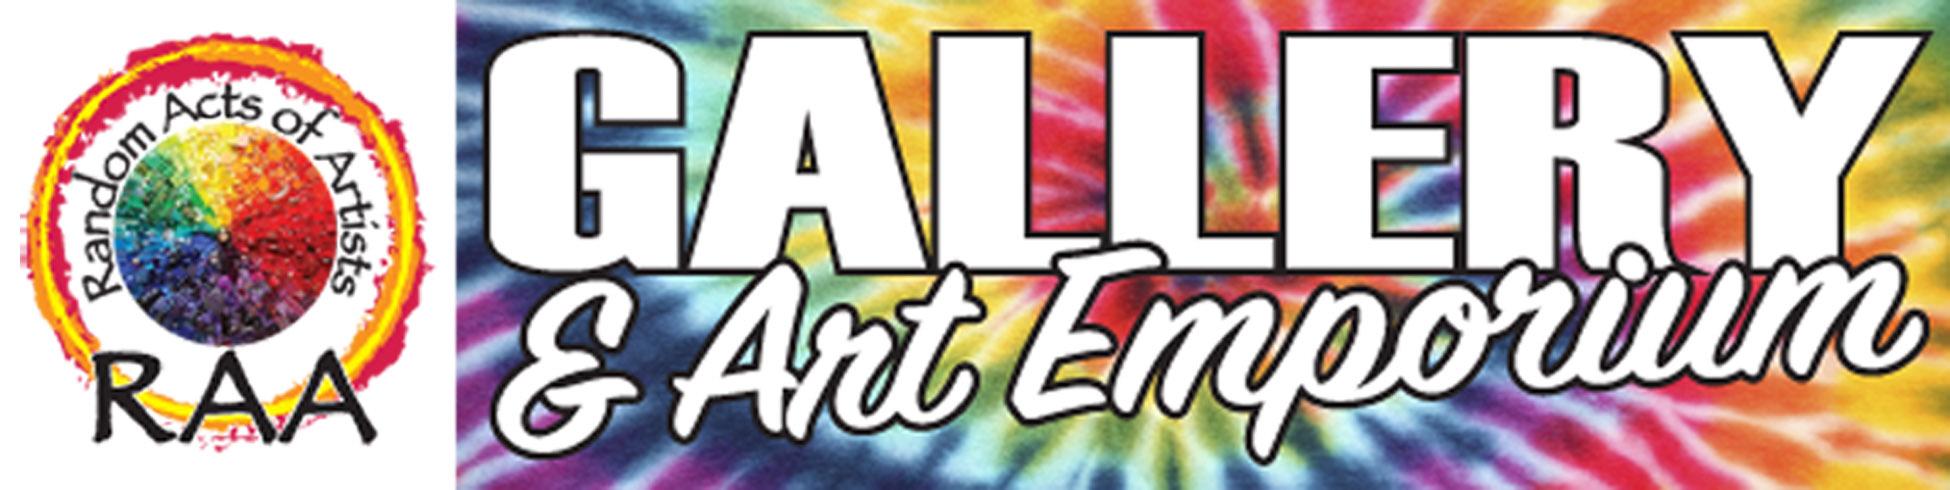 GALLERY AND ART EMPORIUM SIGN-3.jpg